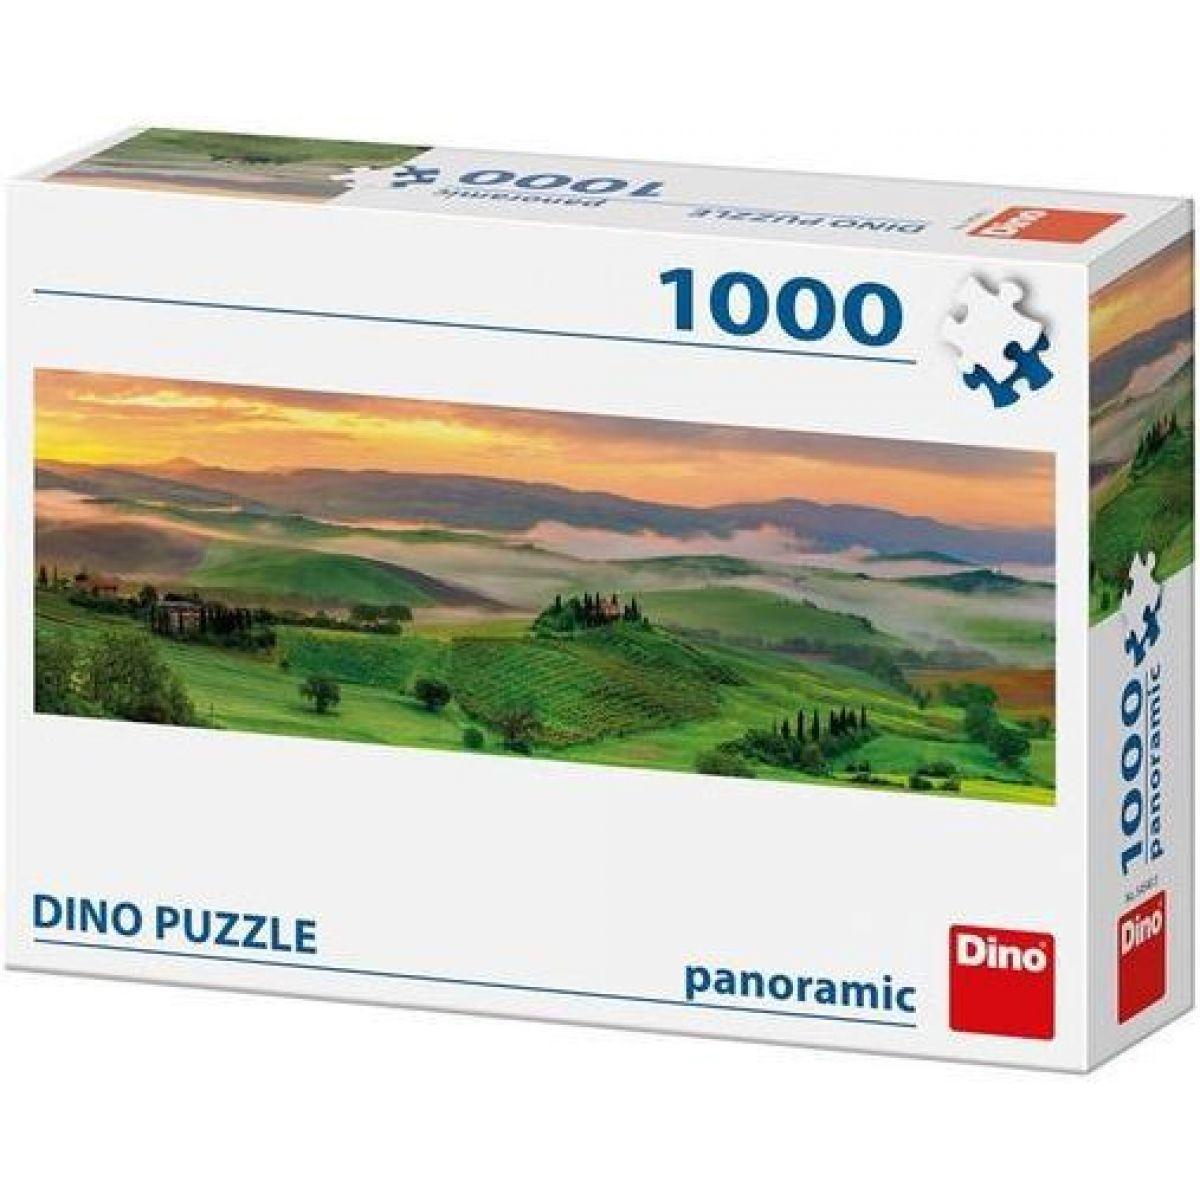 Dino Príroda Panoramic puzzle 1000 dielikov